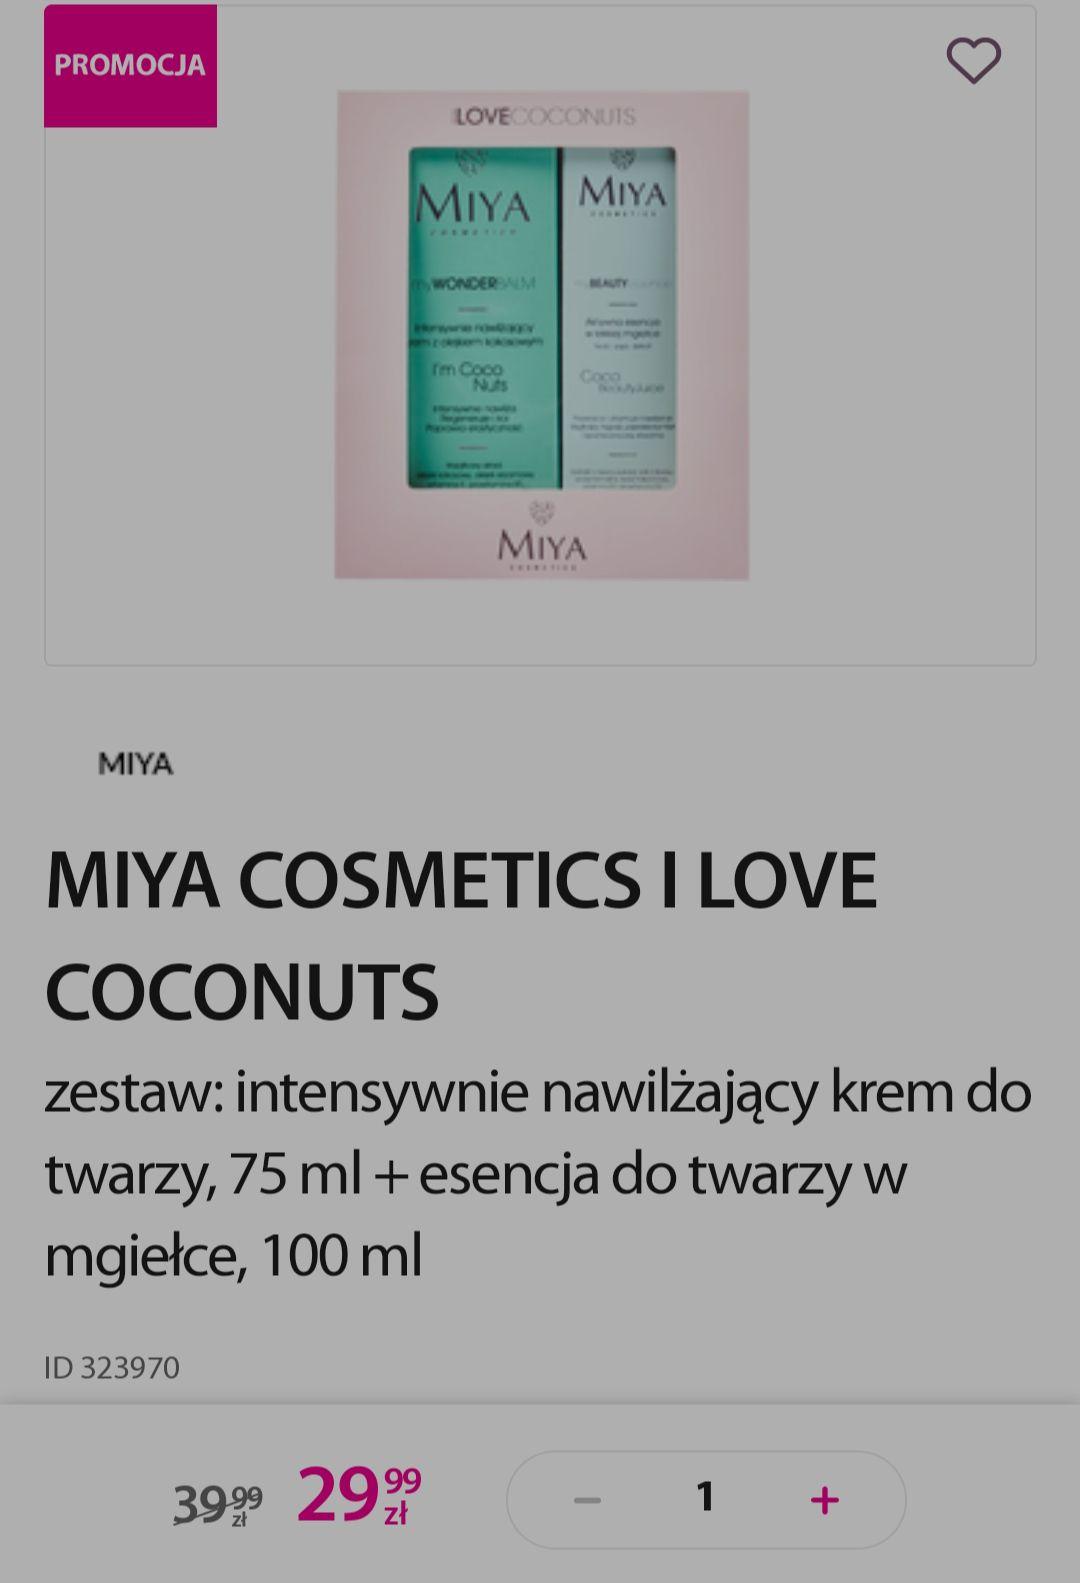 Zestaw Miya Cosmetics I love coconut w Hebe